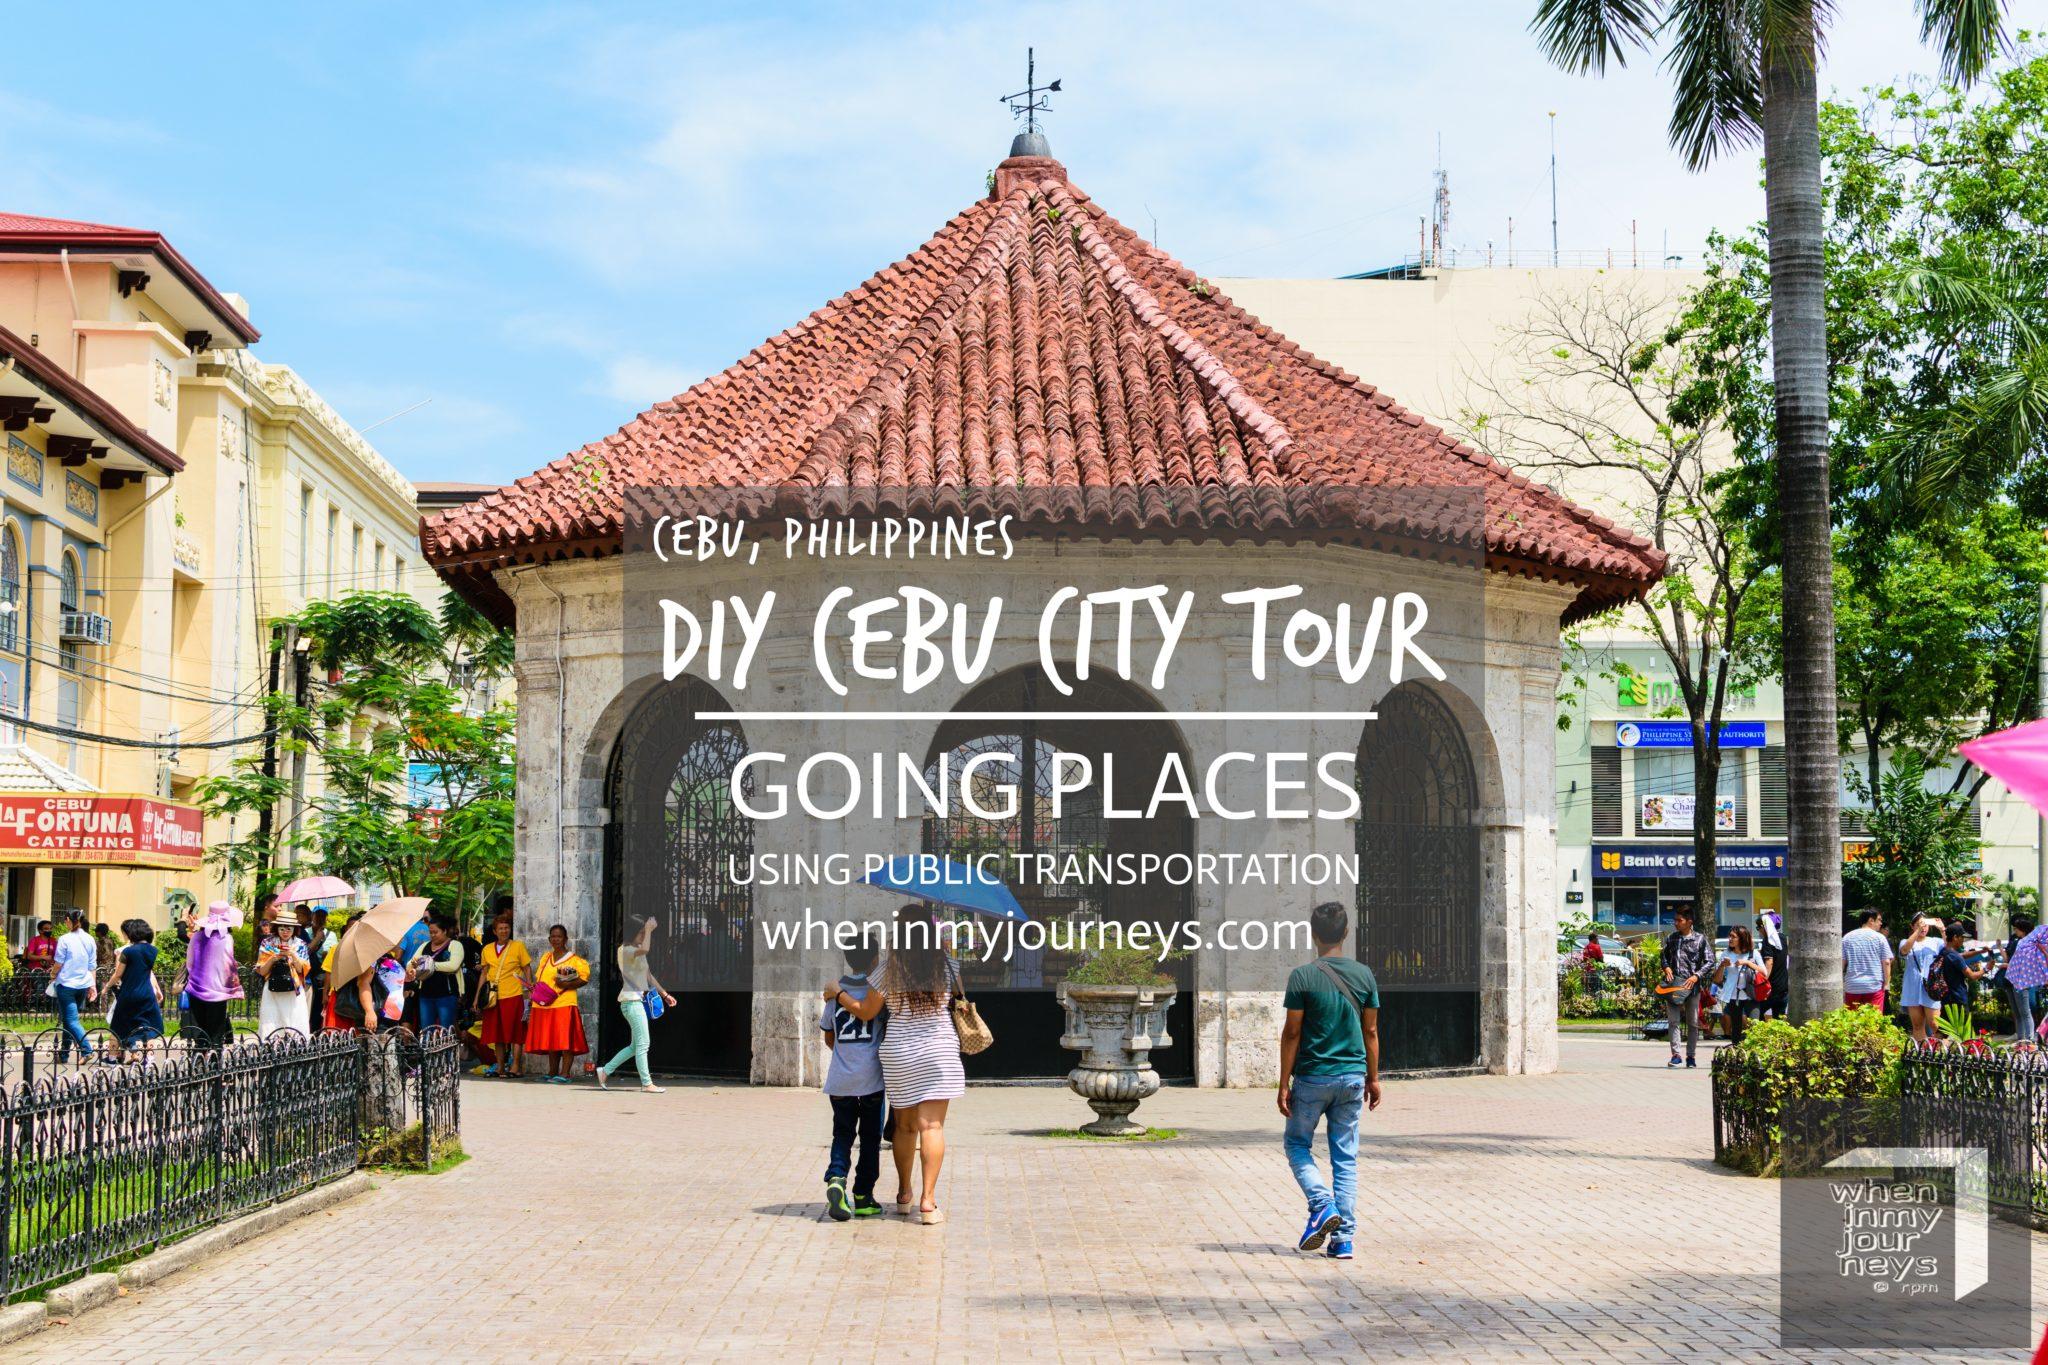 Cebu City Tour Full Day Trip @ Central Visayas, Philippines